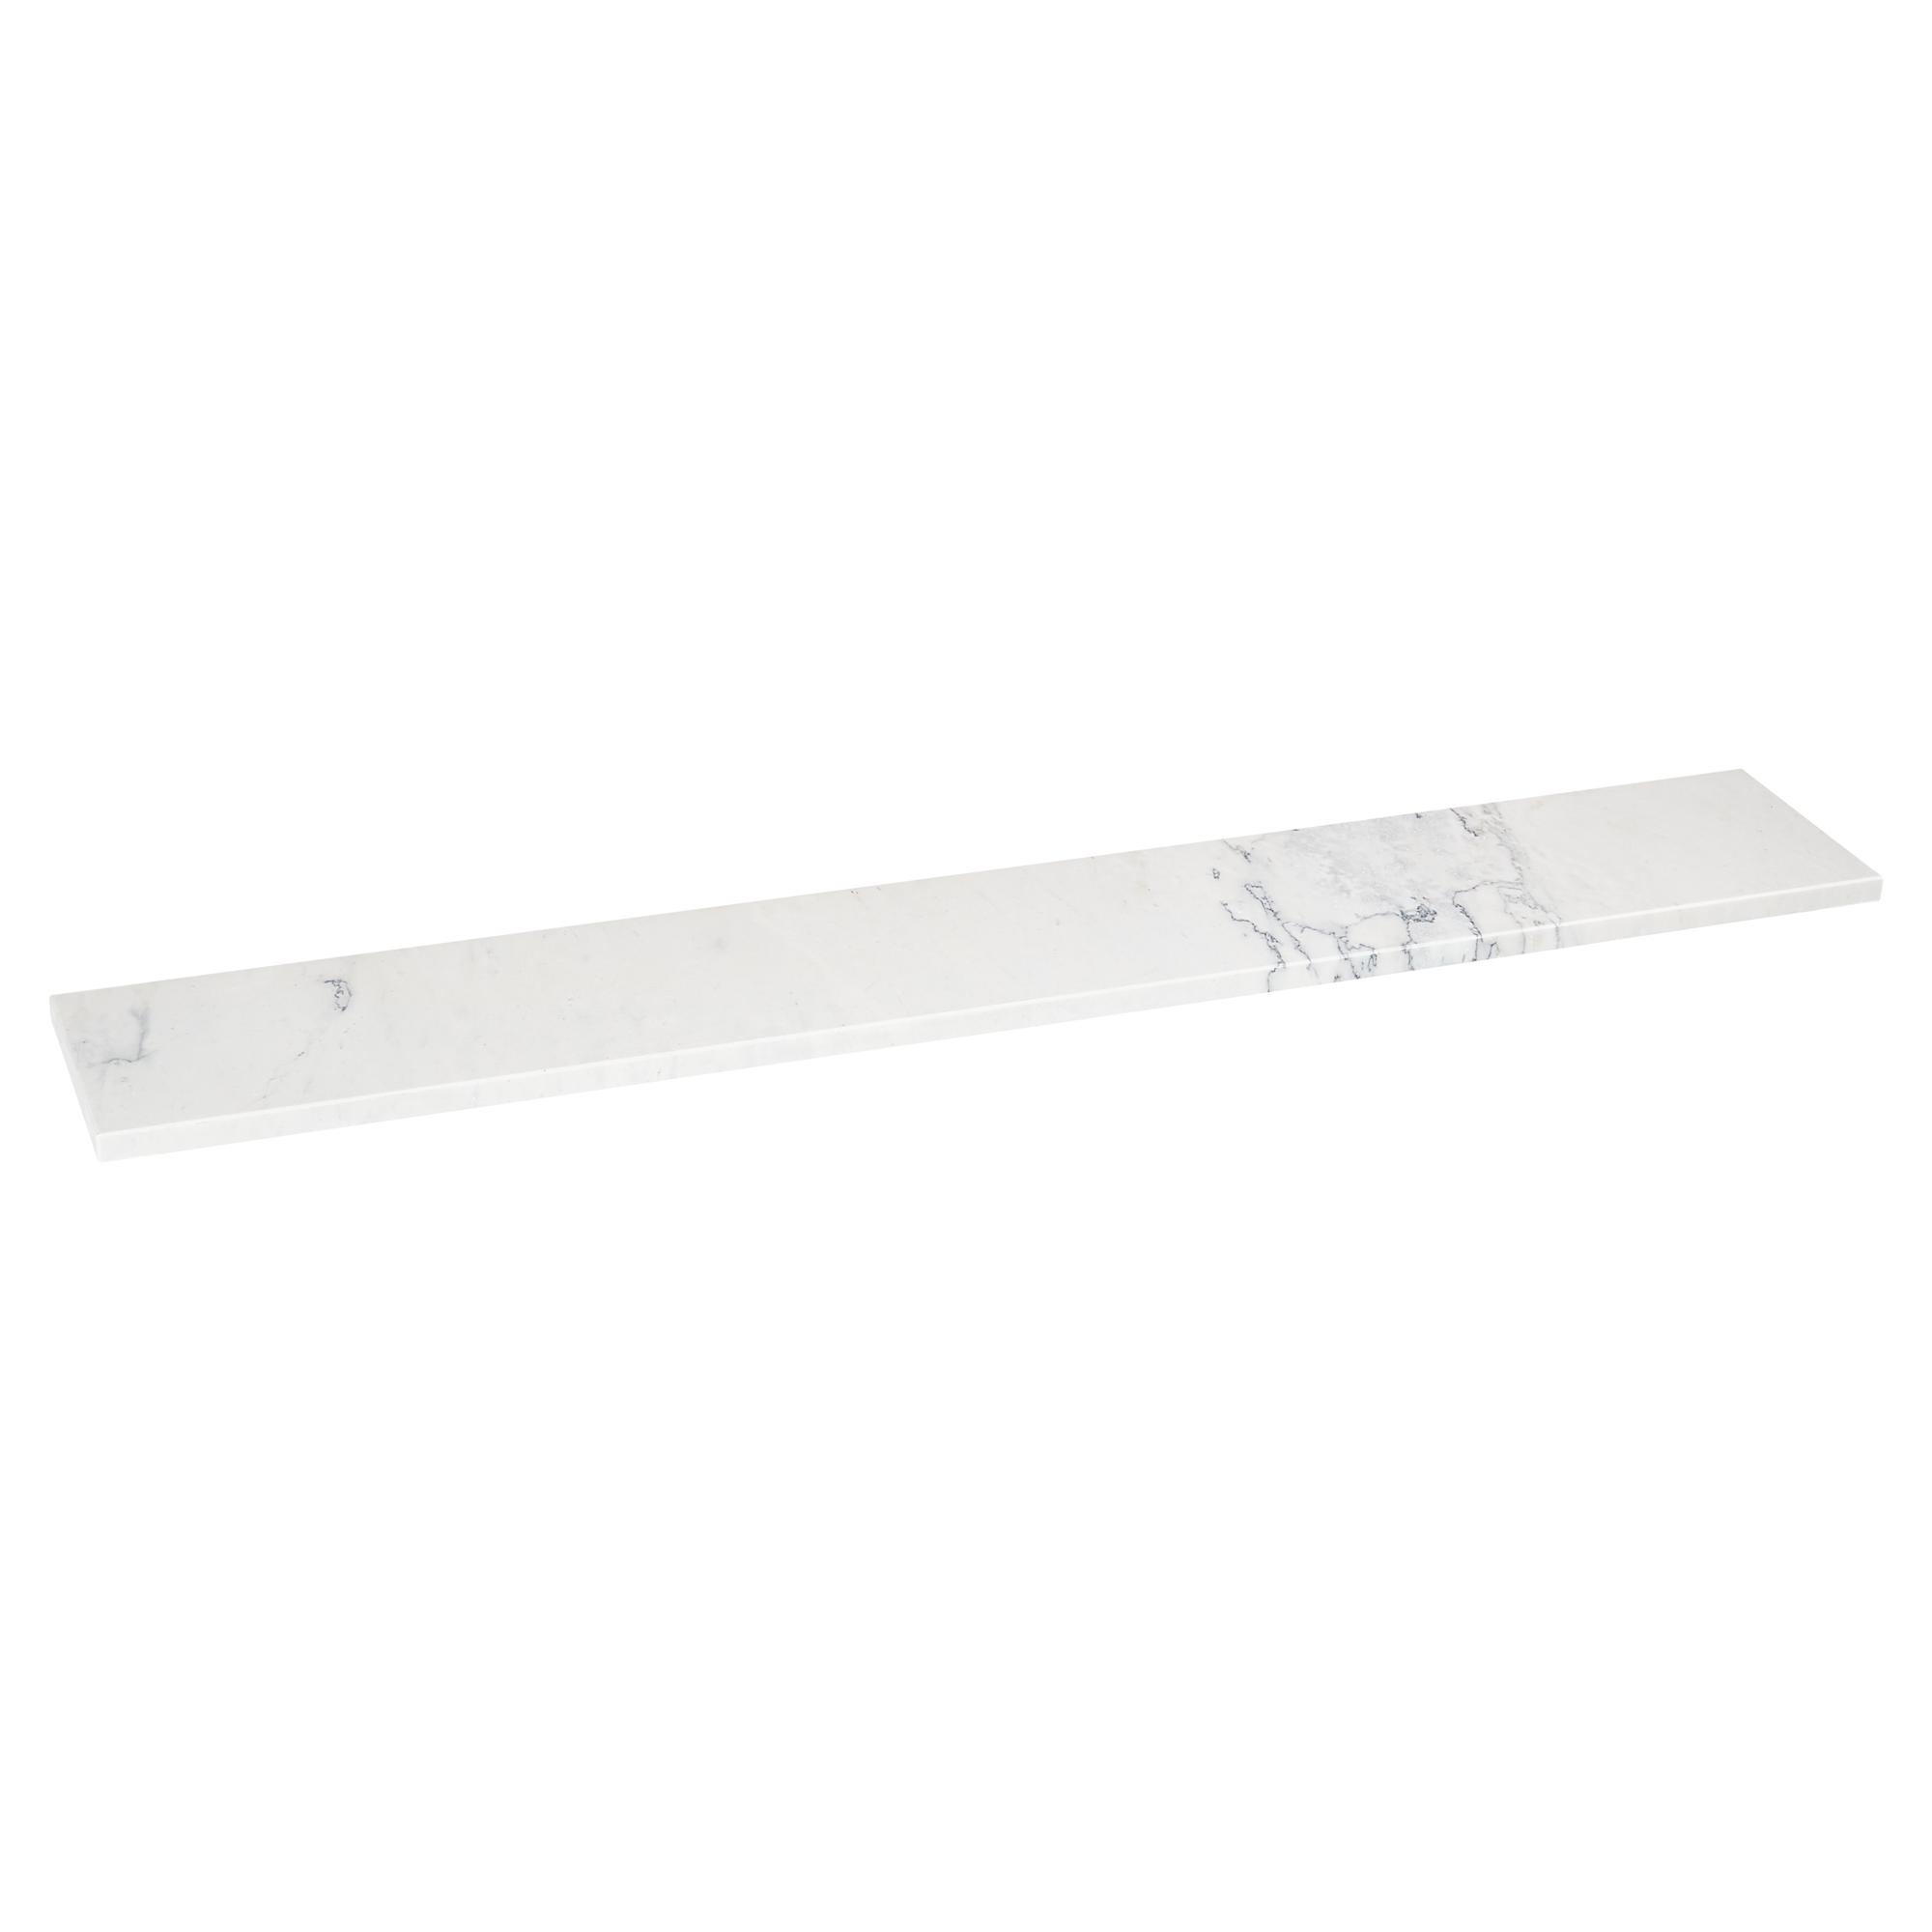 fensterbank bianco carrara marmor wei 126 x 20 cm toom baumarkt. Black Bedroom Furniture Sets. Home Design Ideas